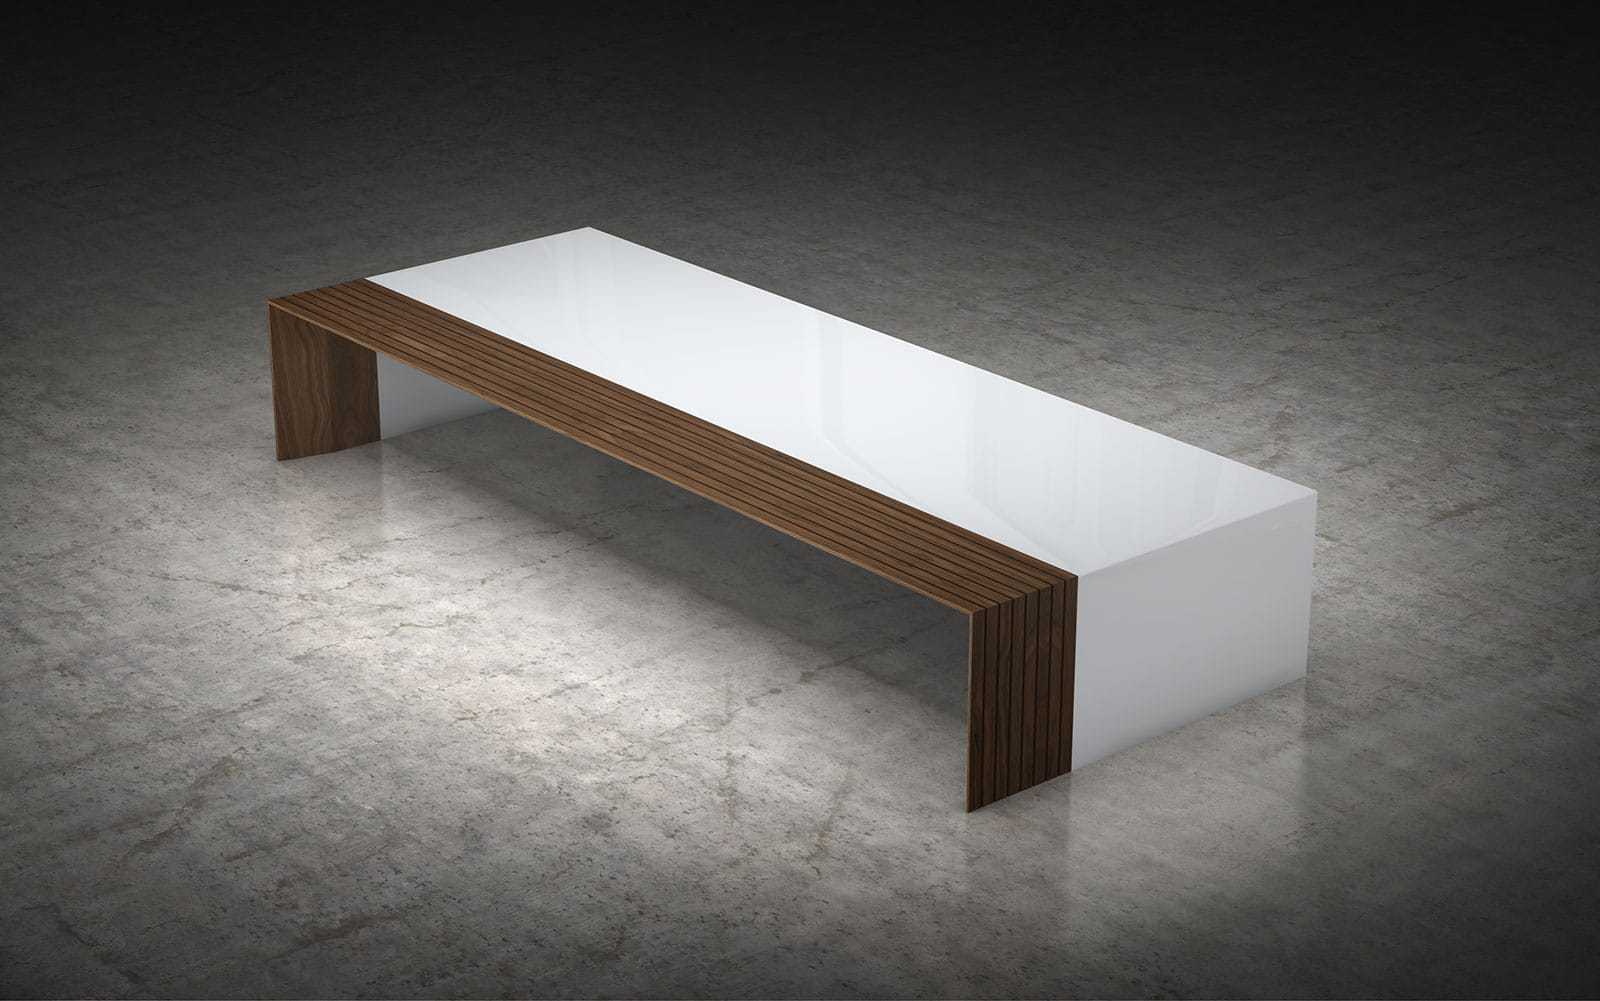 Beckenham Coffee Table White Lacquer and Walnut by Modloft